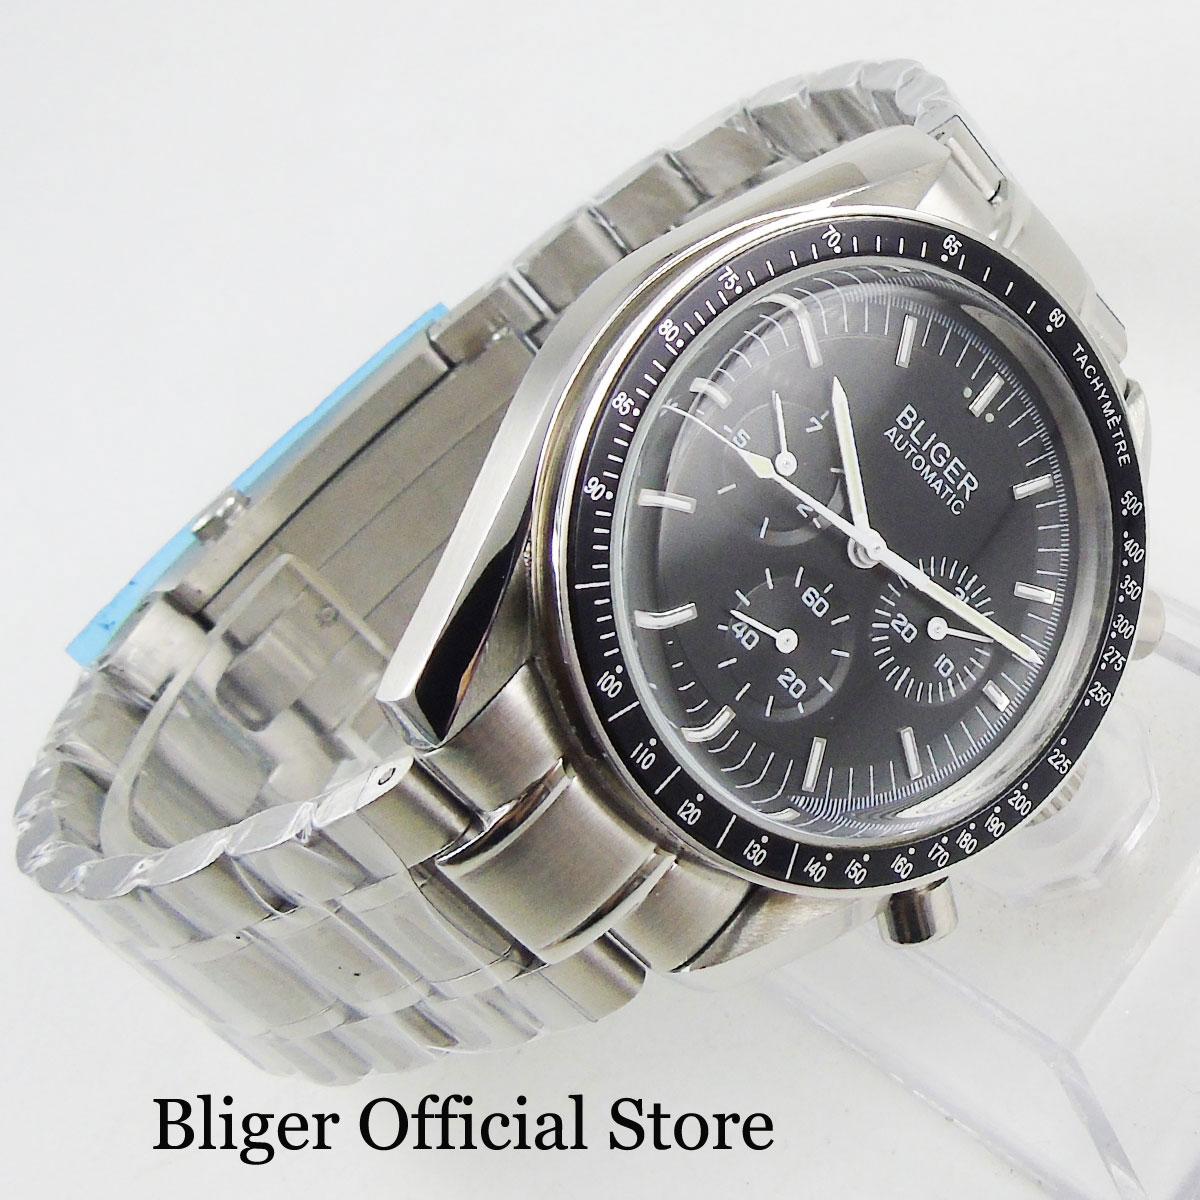 Relógio masculino na cor preta, relógio de